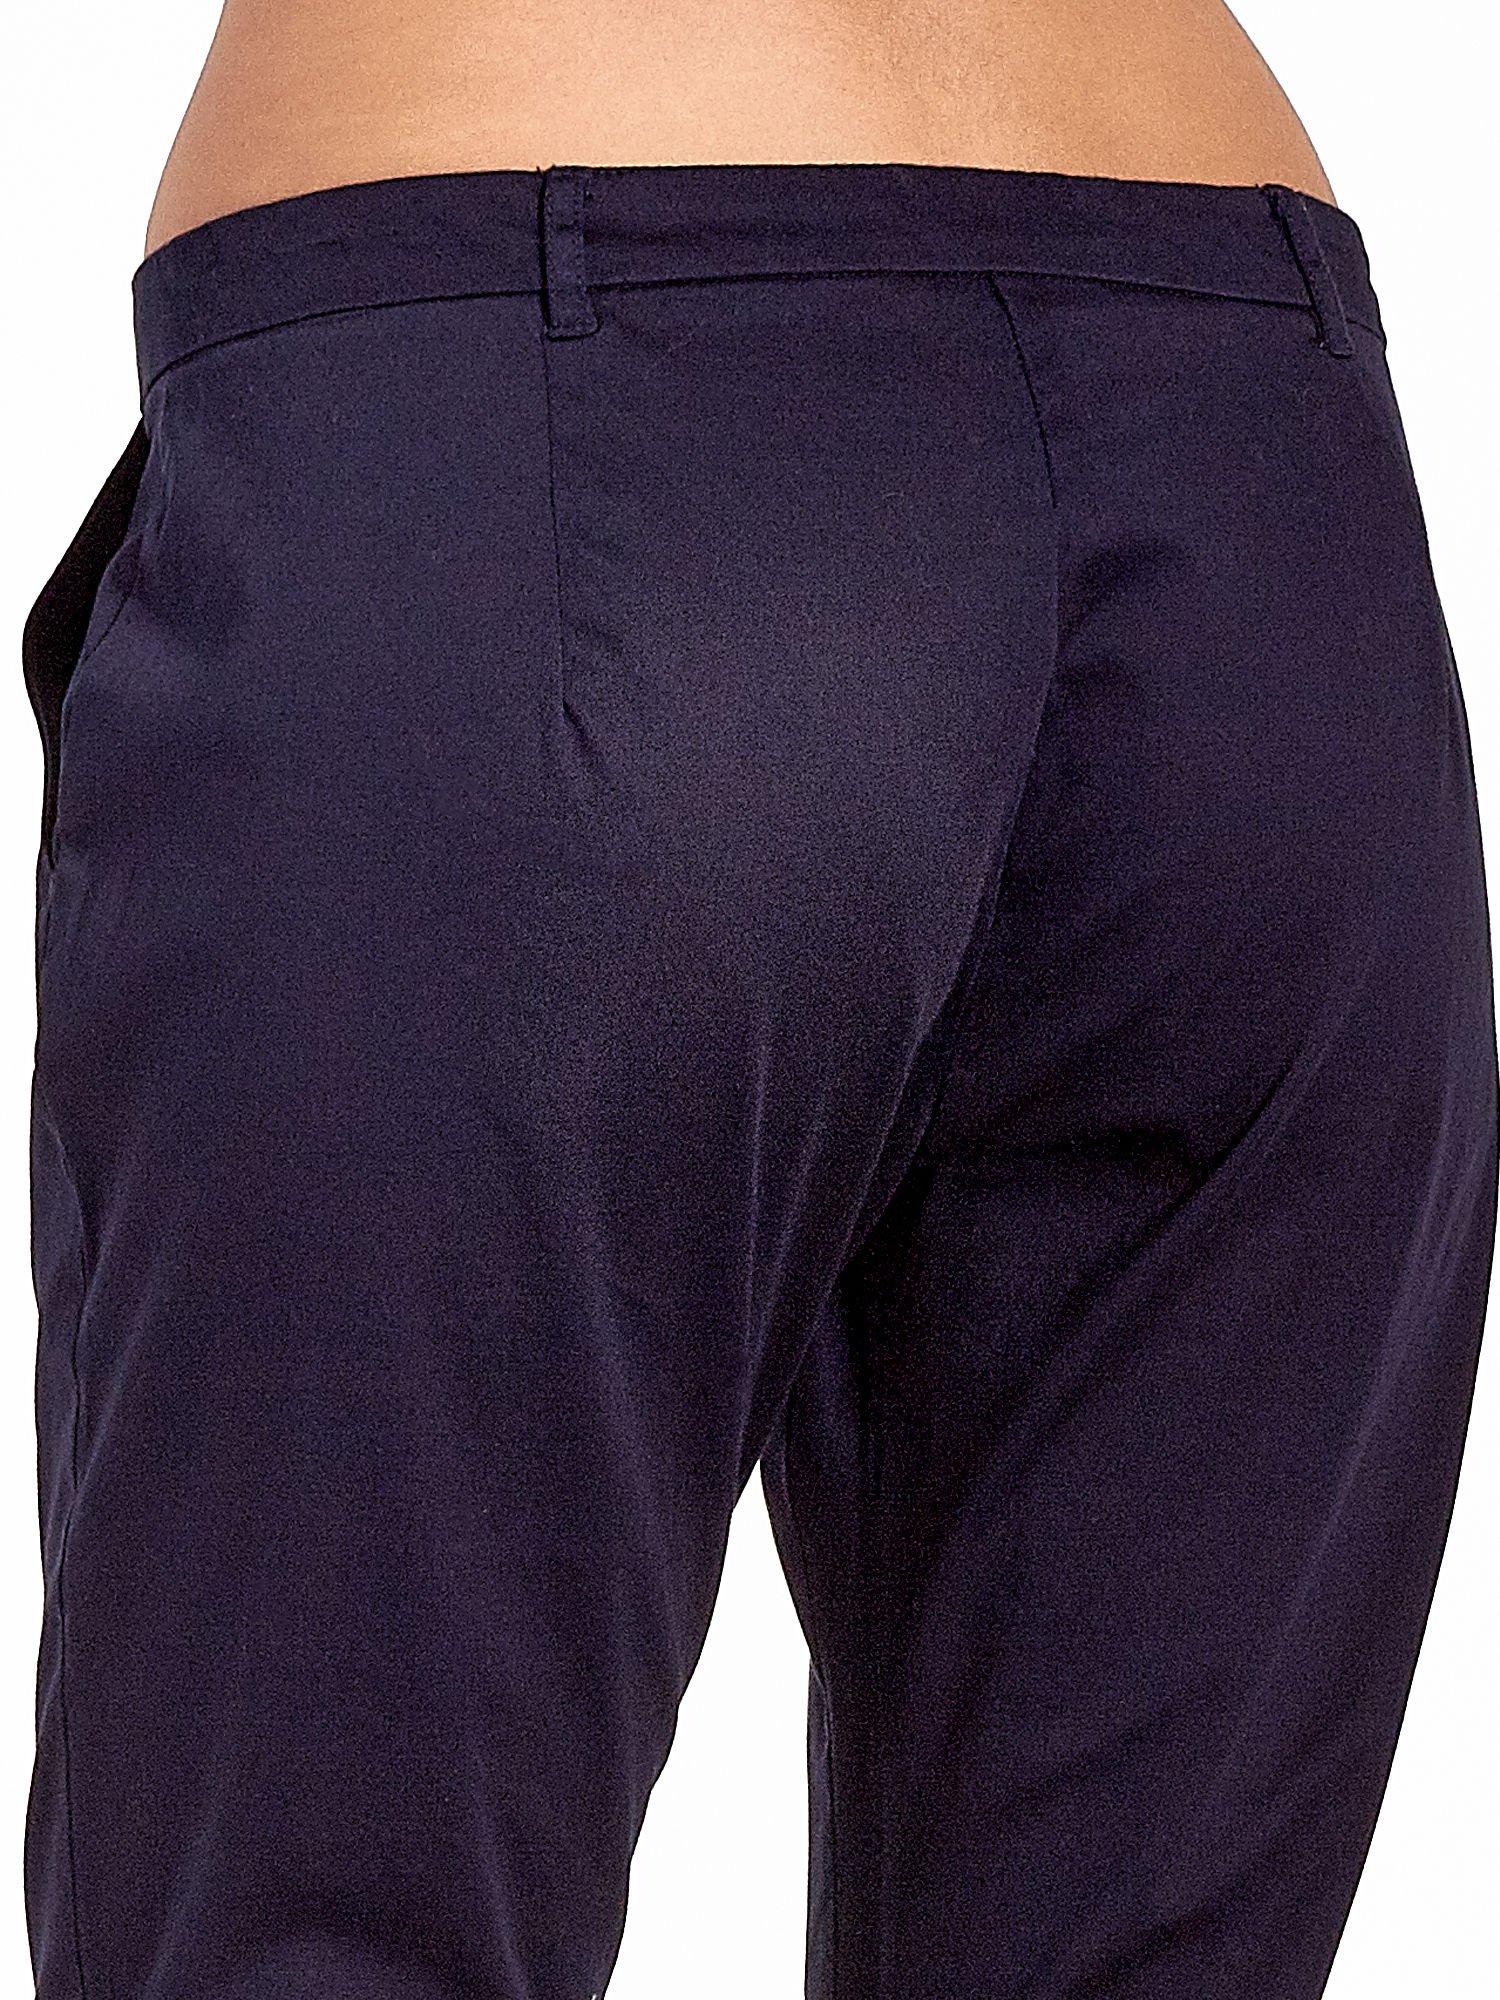 Granatowe eleganckie spodnie za kolano                                  zdj.                                  6